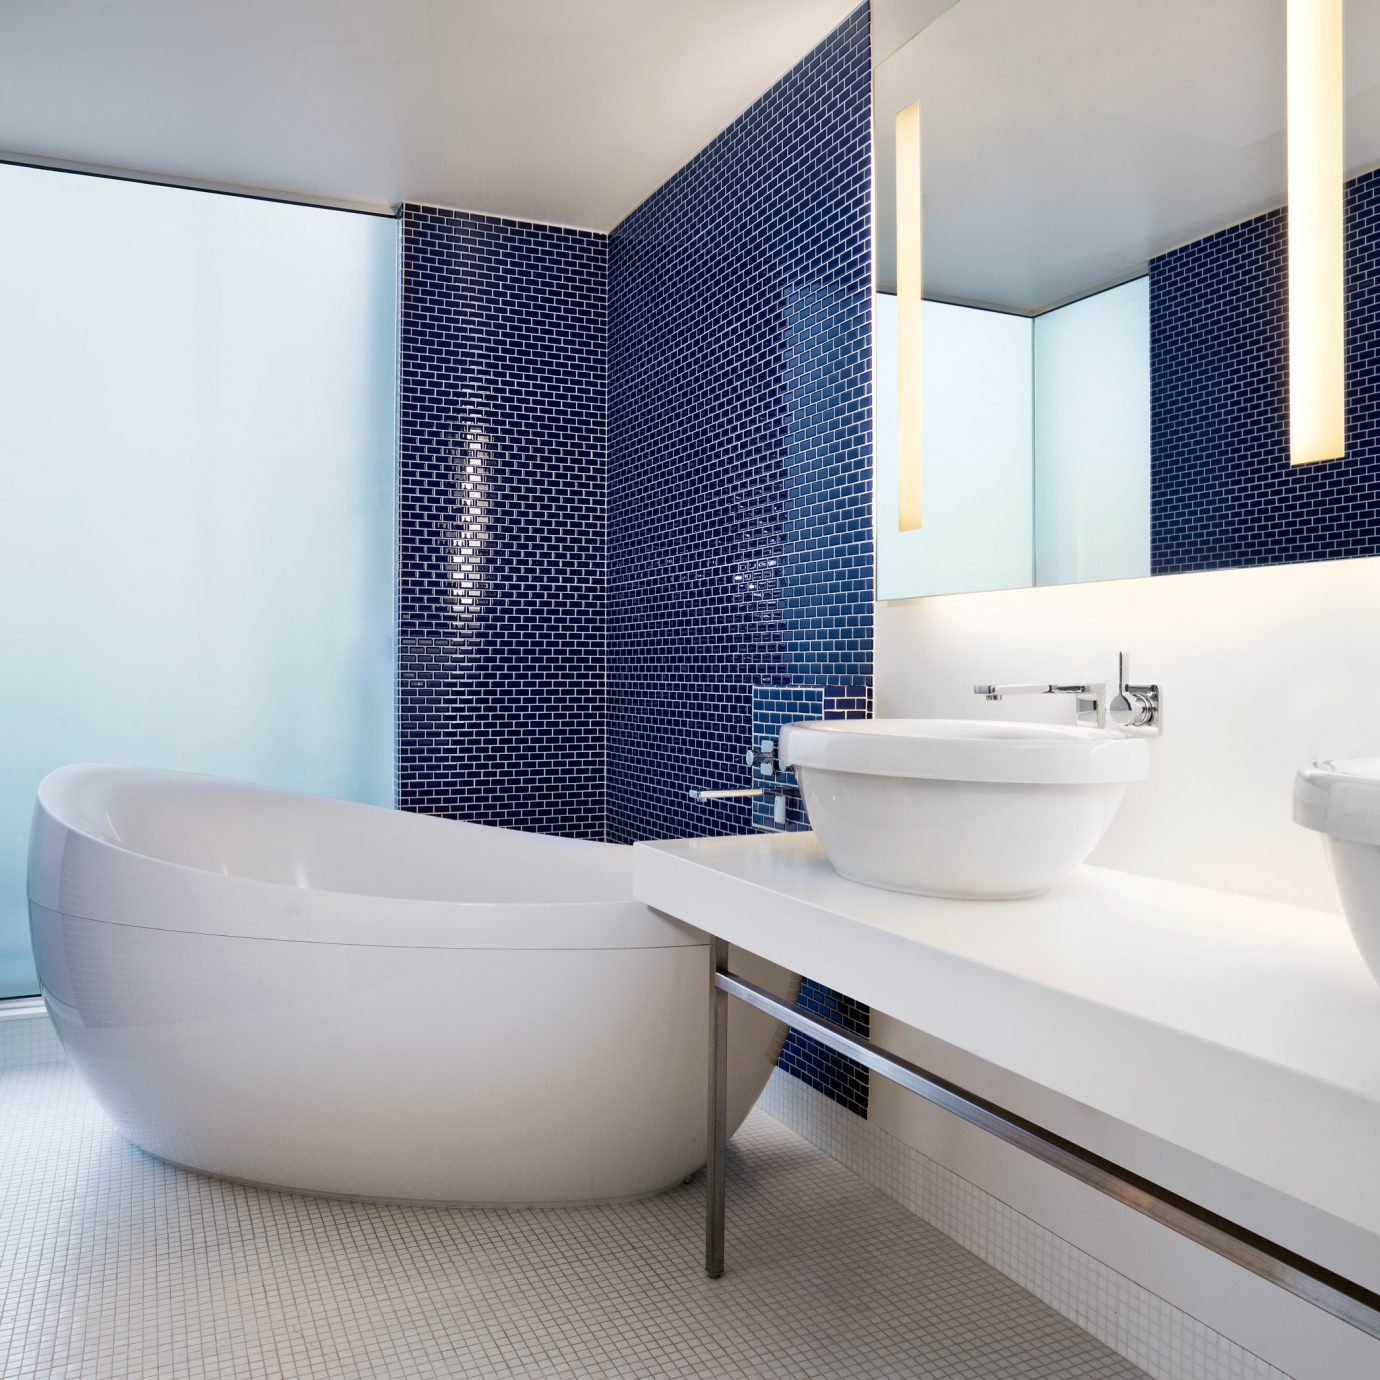 Bath Hip Modern bathroom tub bathtub sink white bidet plumbing fixture swimming pool Suite flooring tile tiled